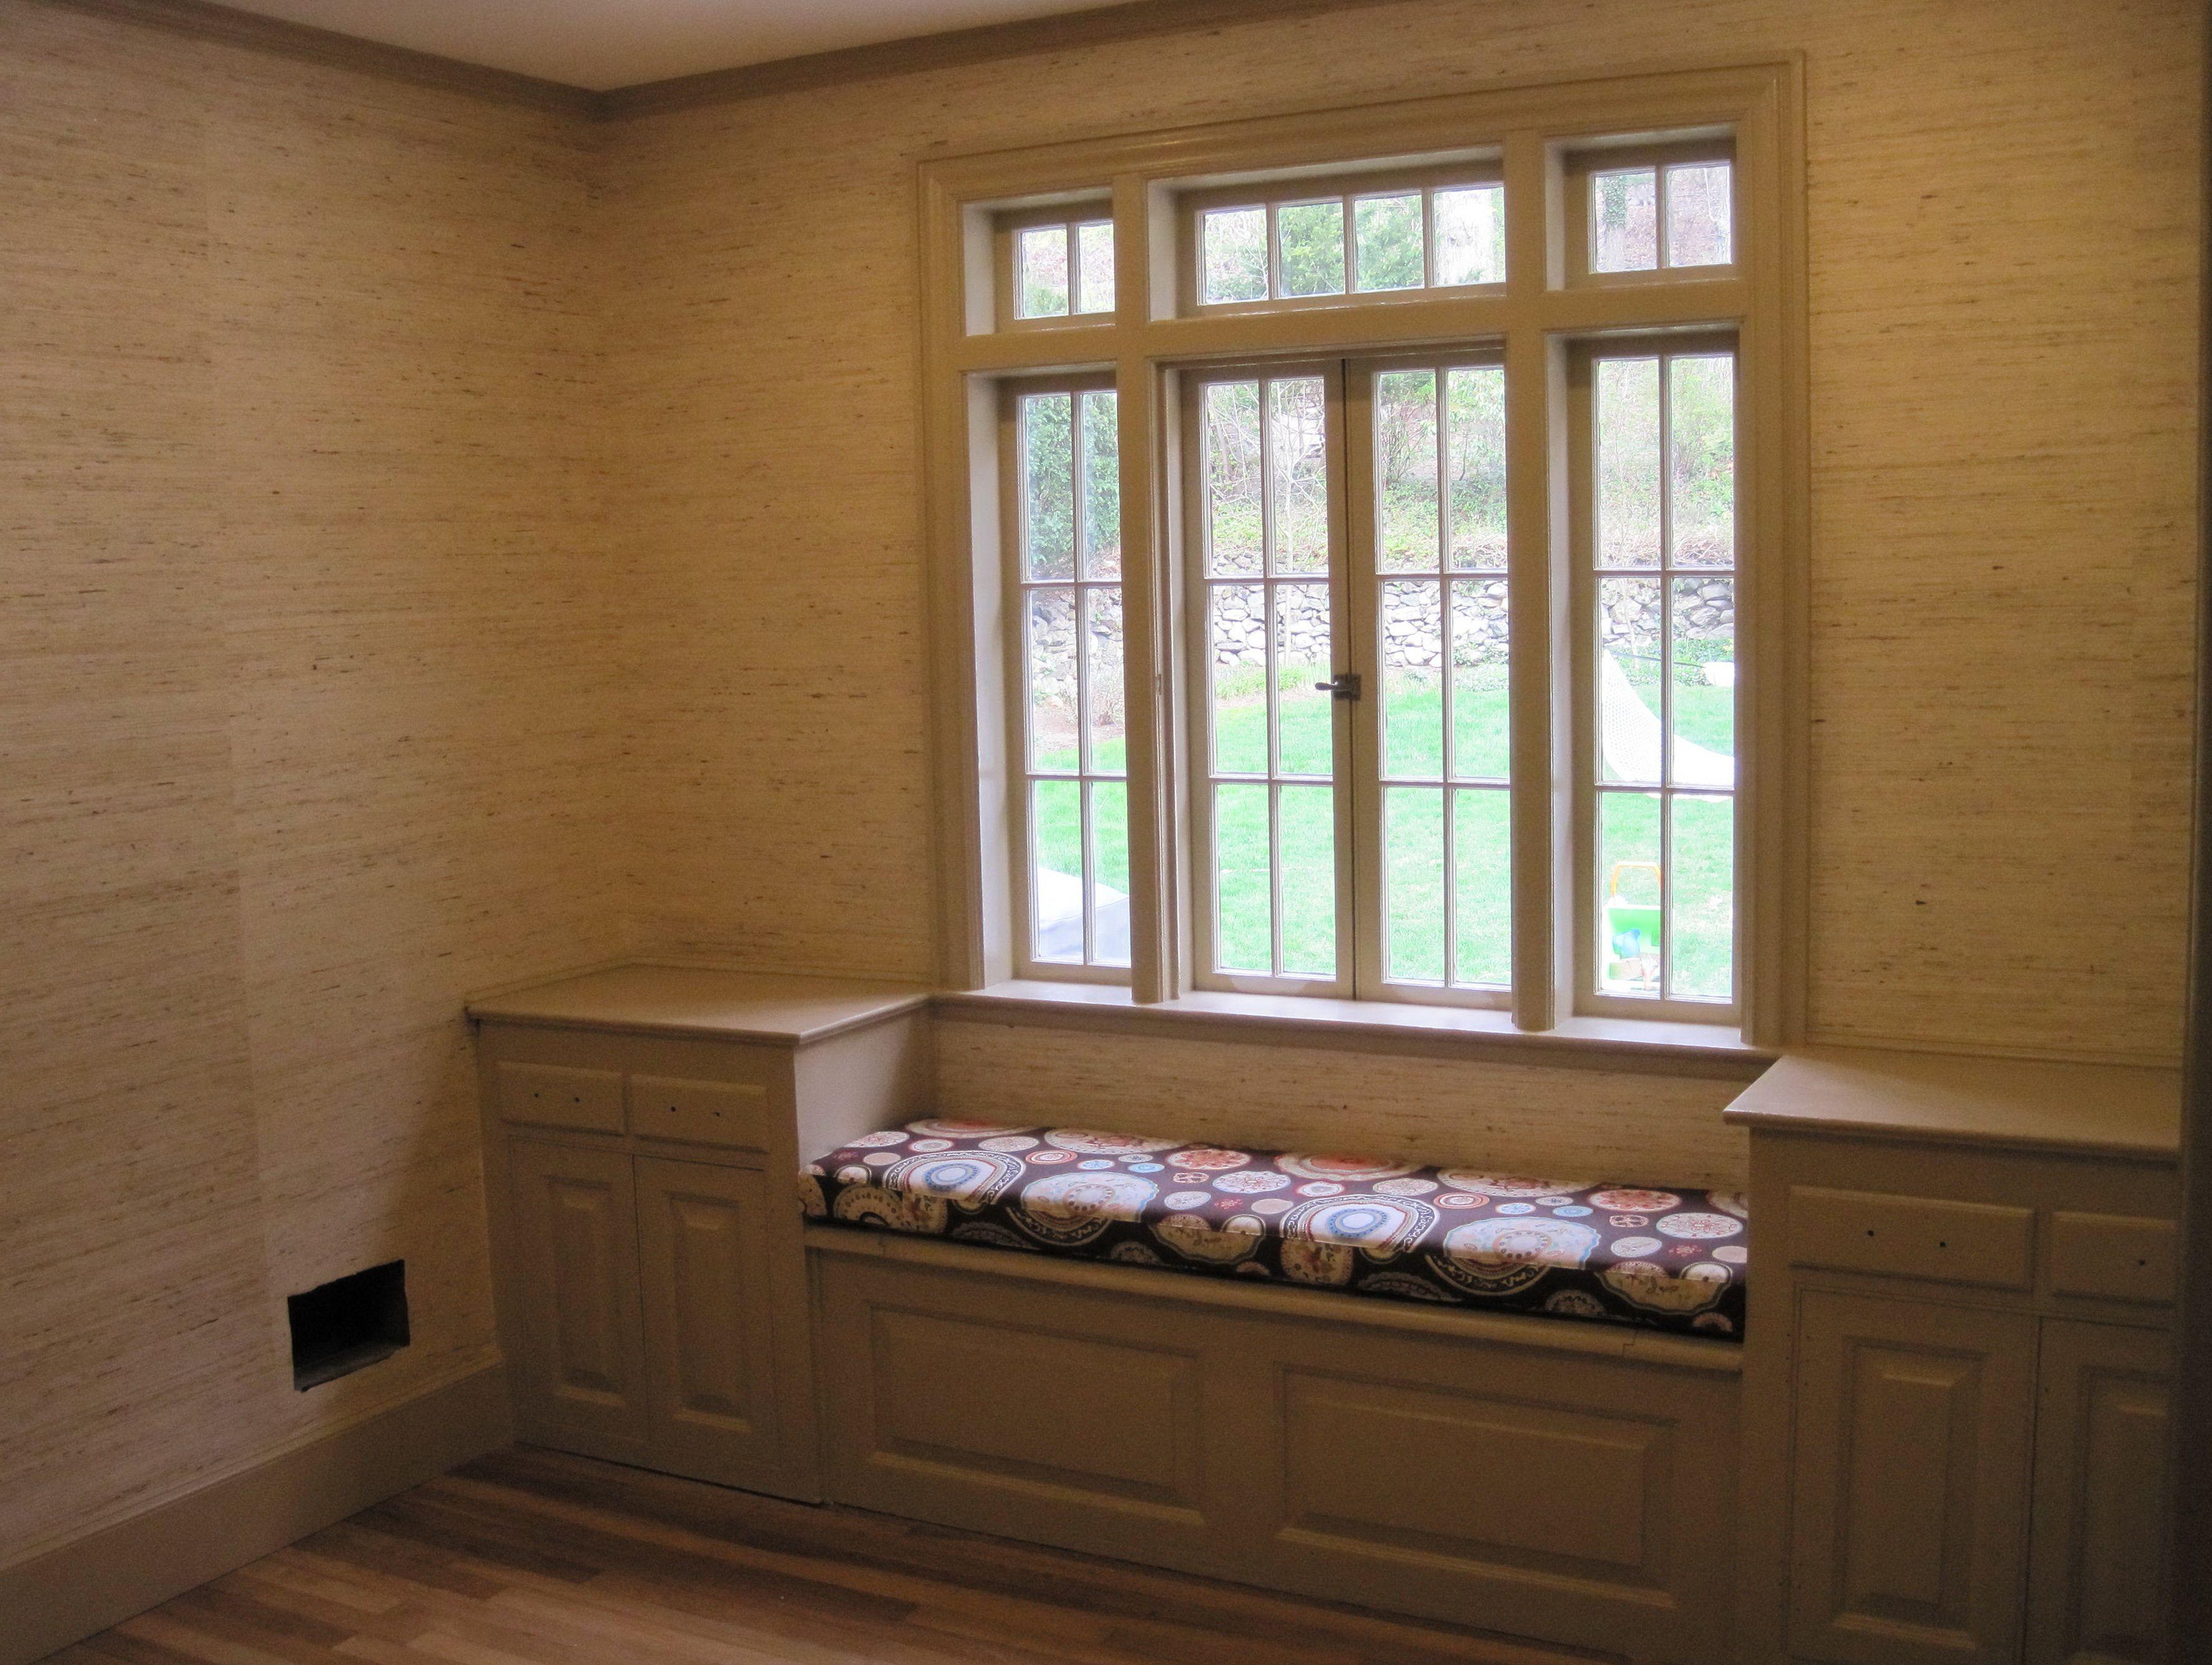 Window With Seat window seat bench diy | house | pinterest